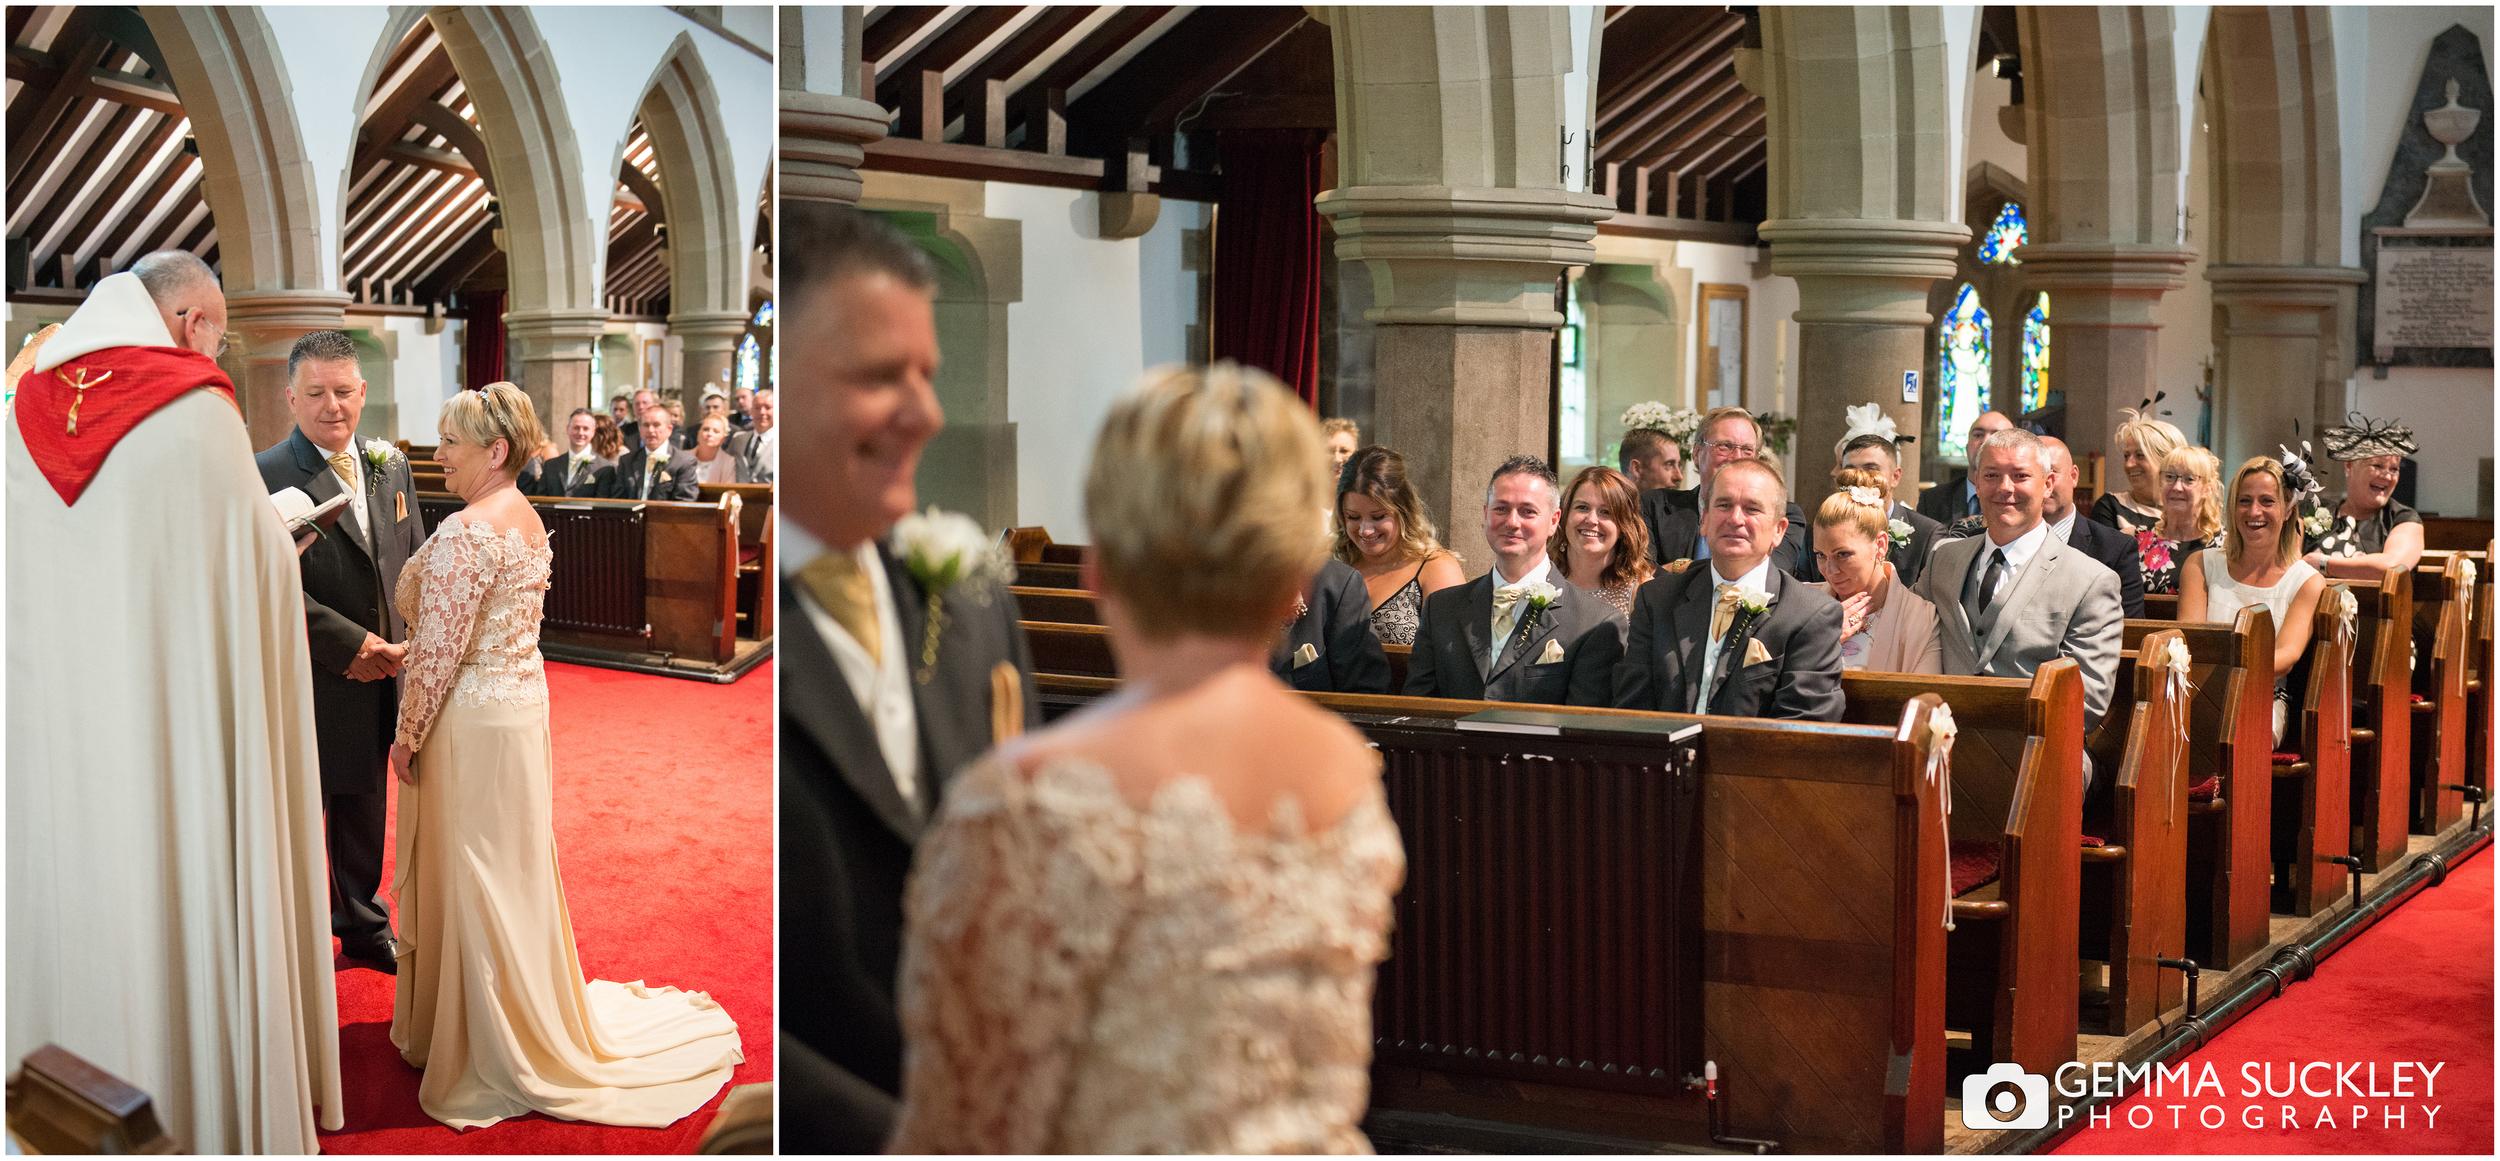 wedding-at-carleton-church-skipton.jpg